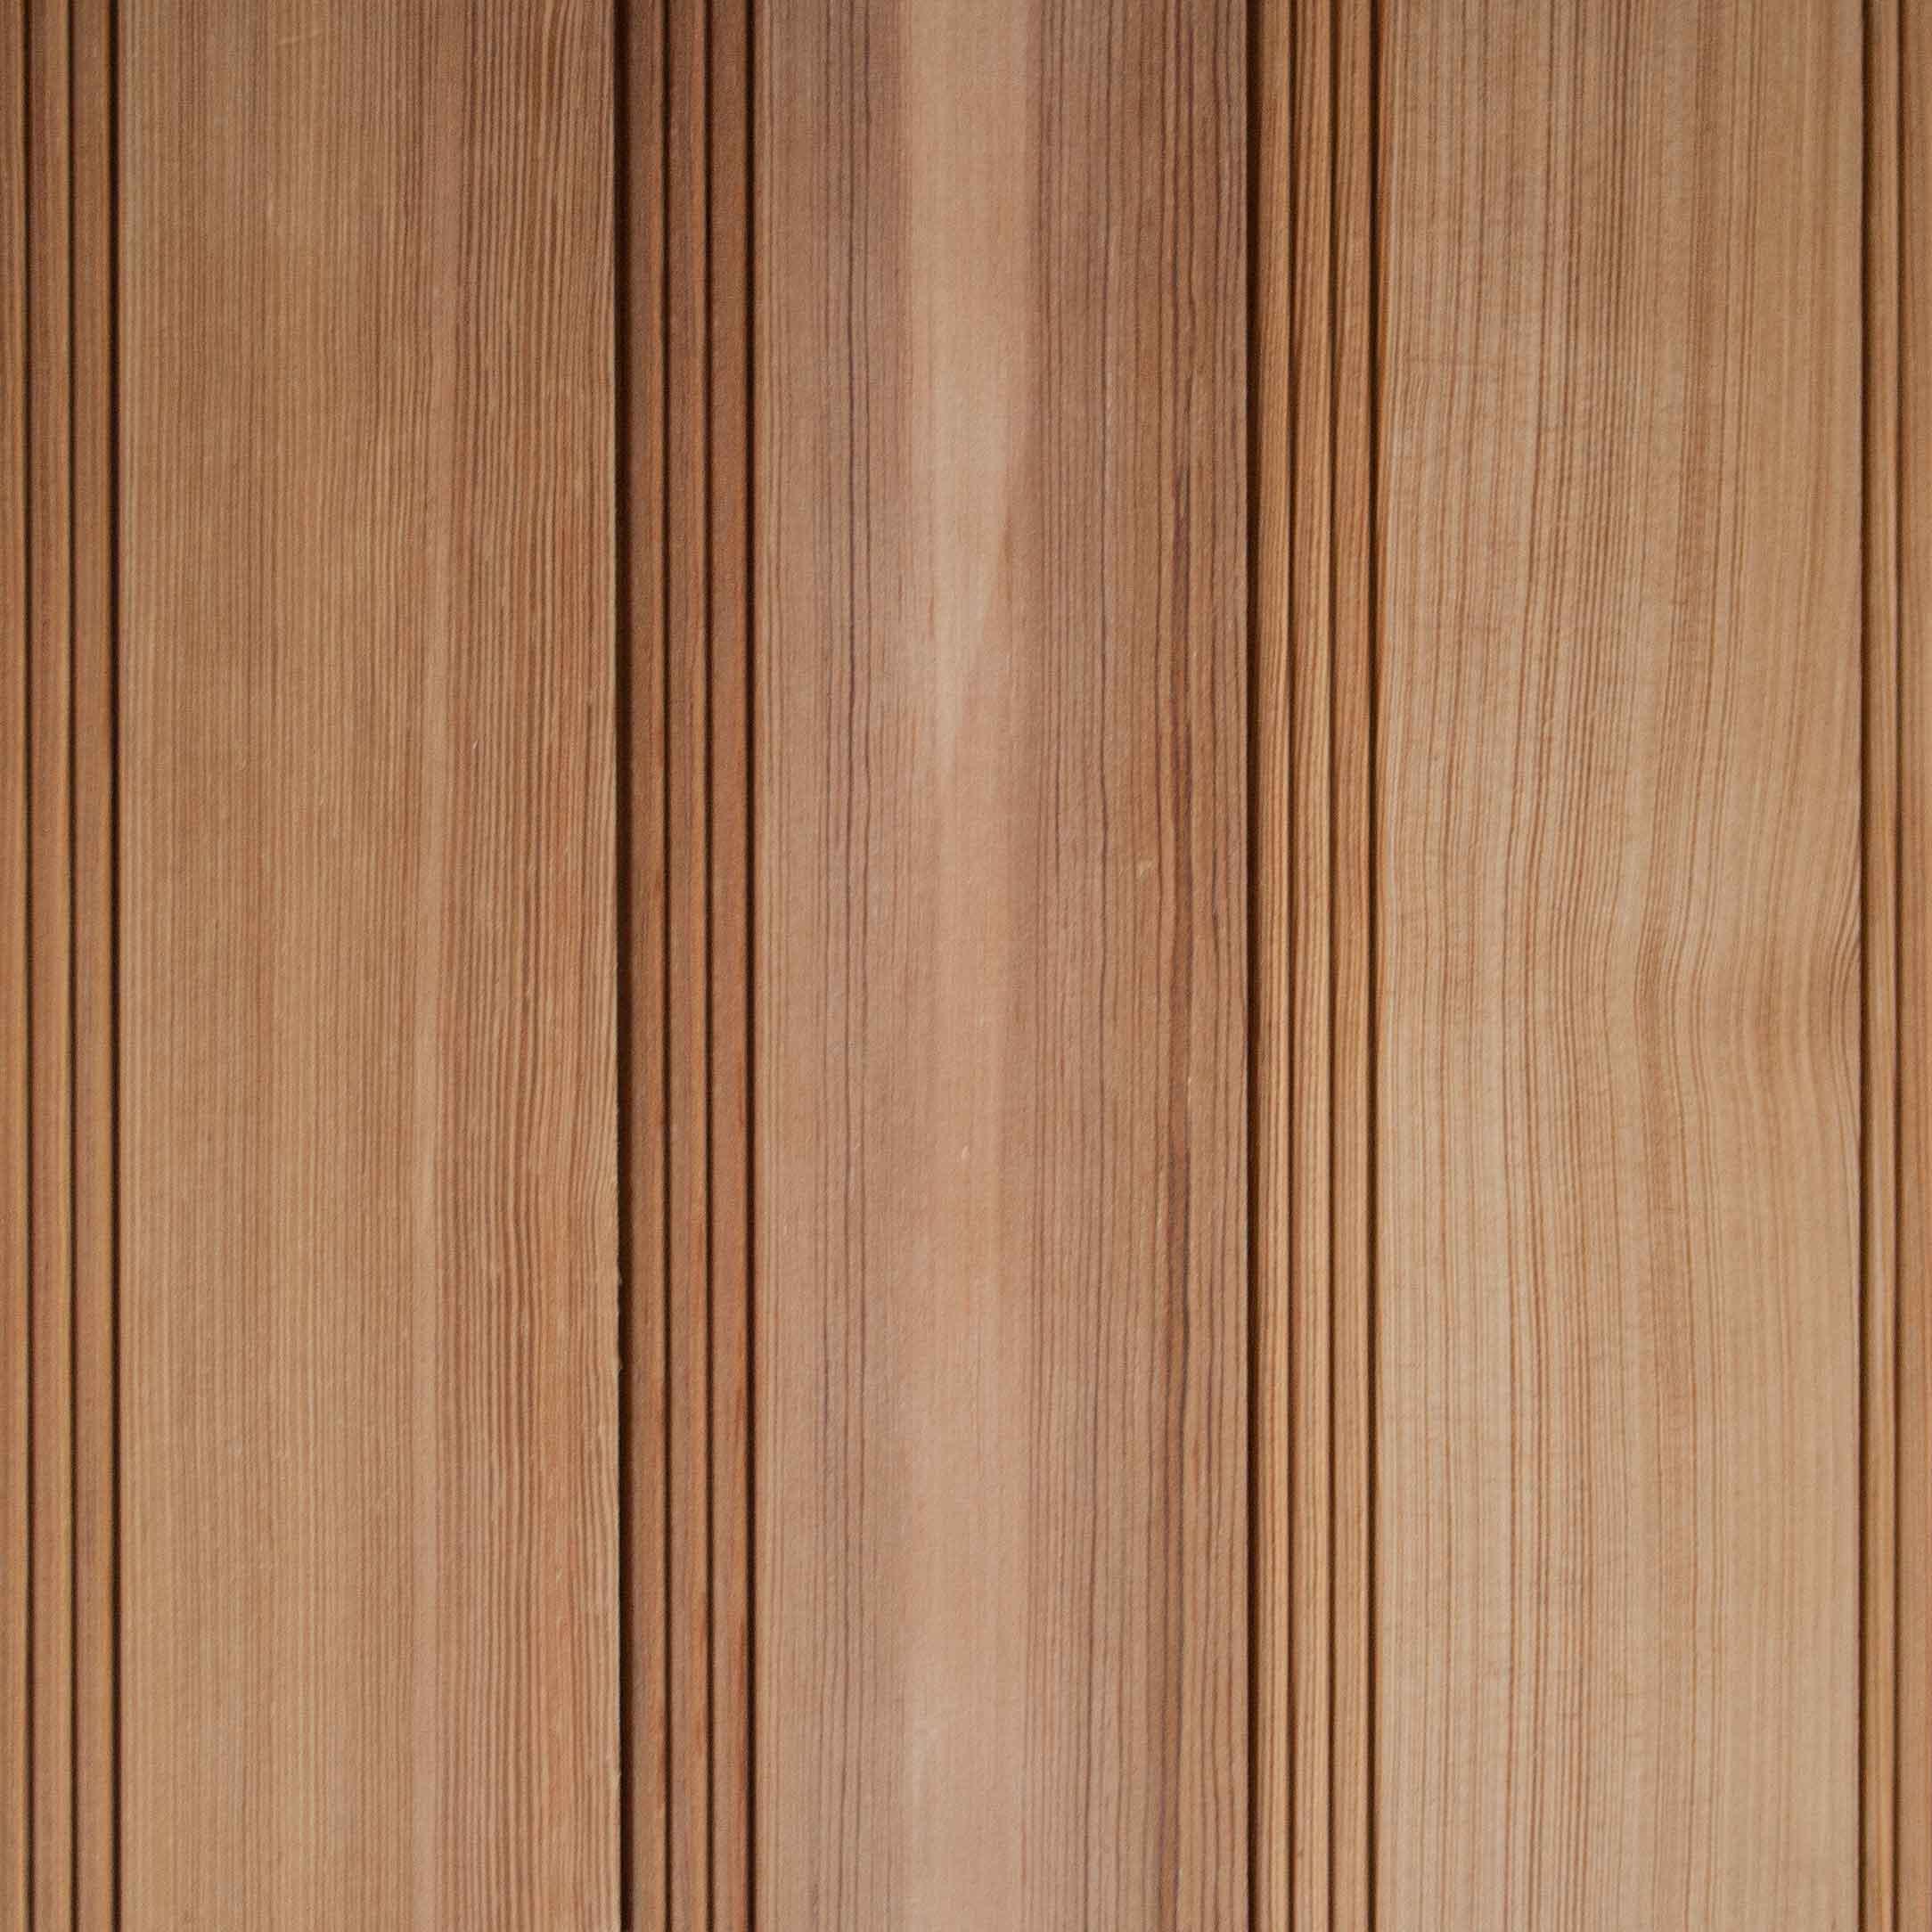 Longleaf lumber bright planed heart pine paneling for Triple a flooring